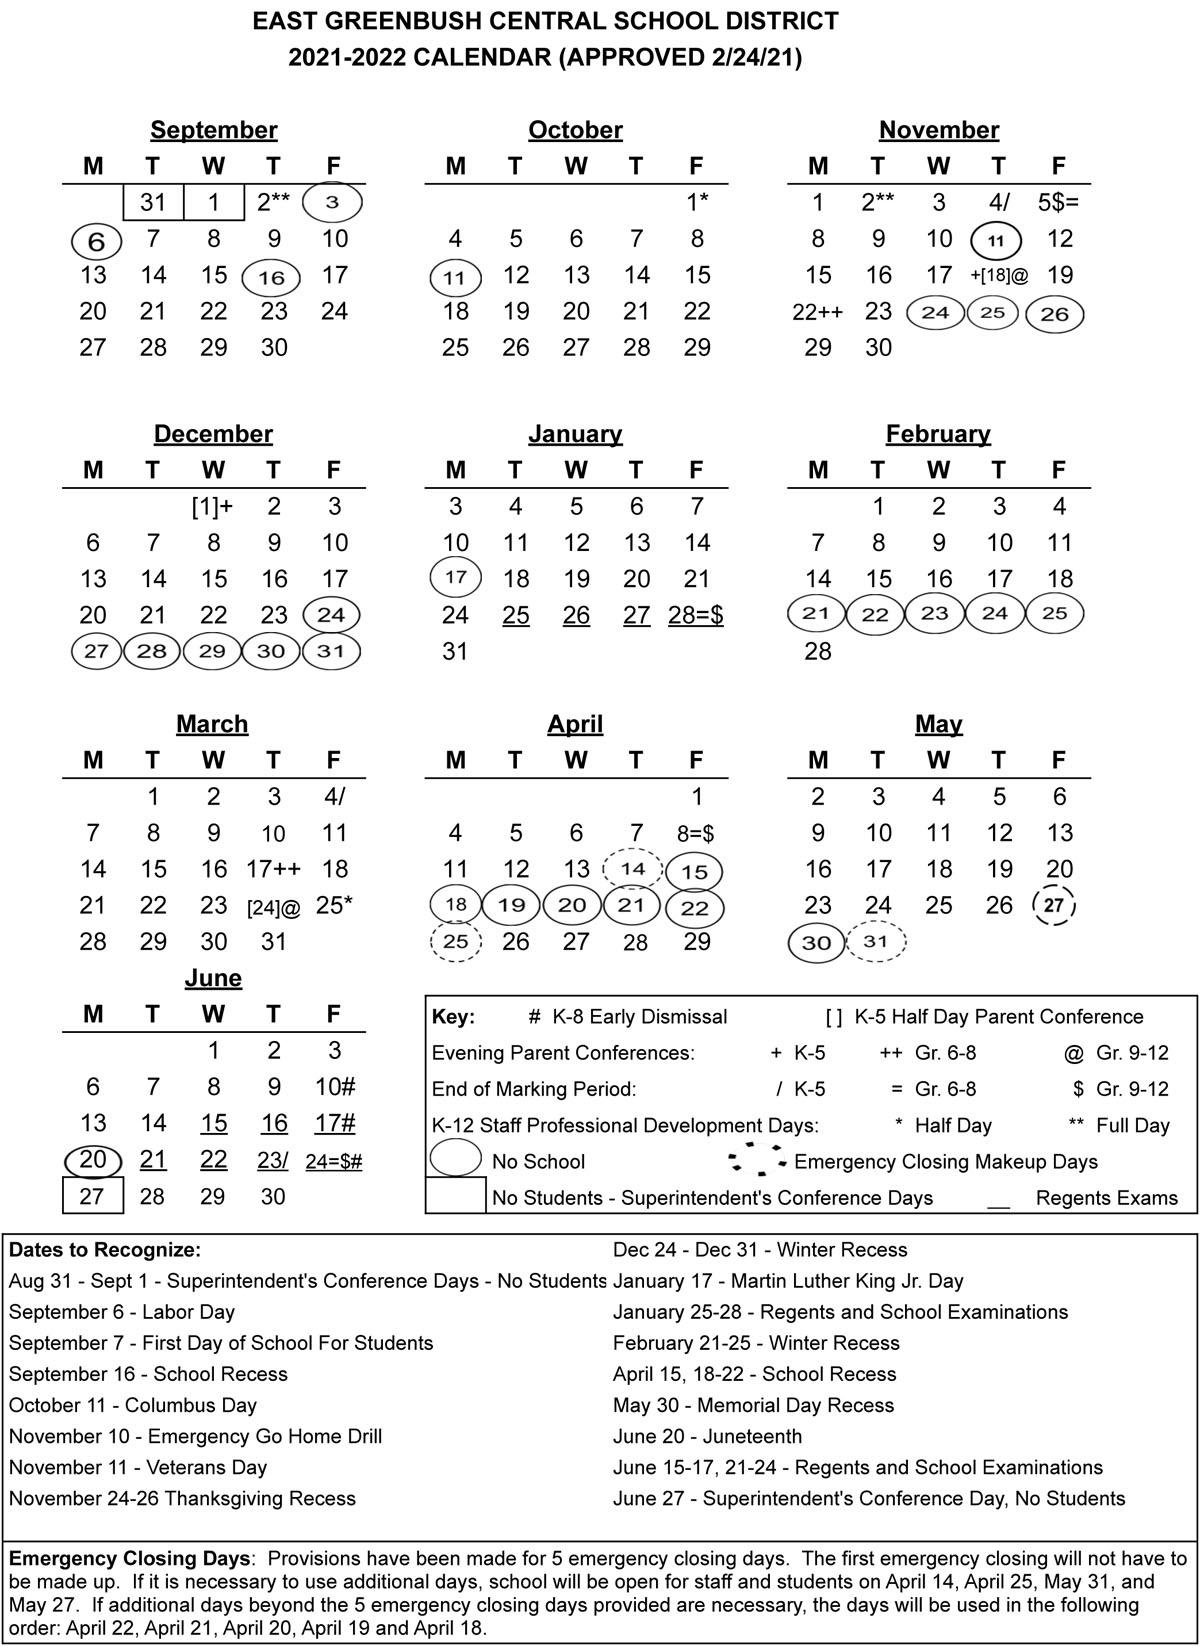 2021-22 Calendar at a Glance